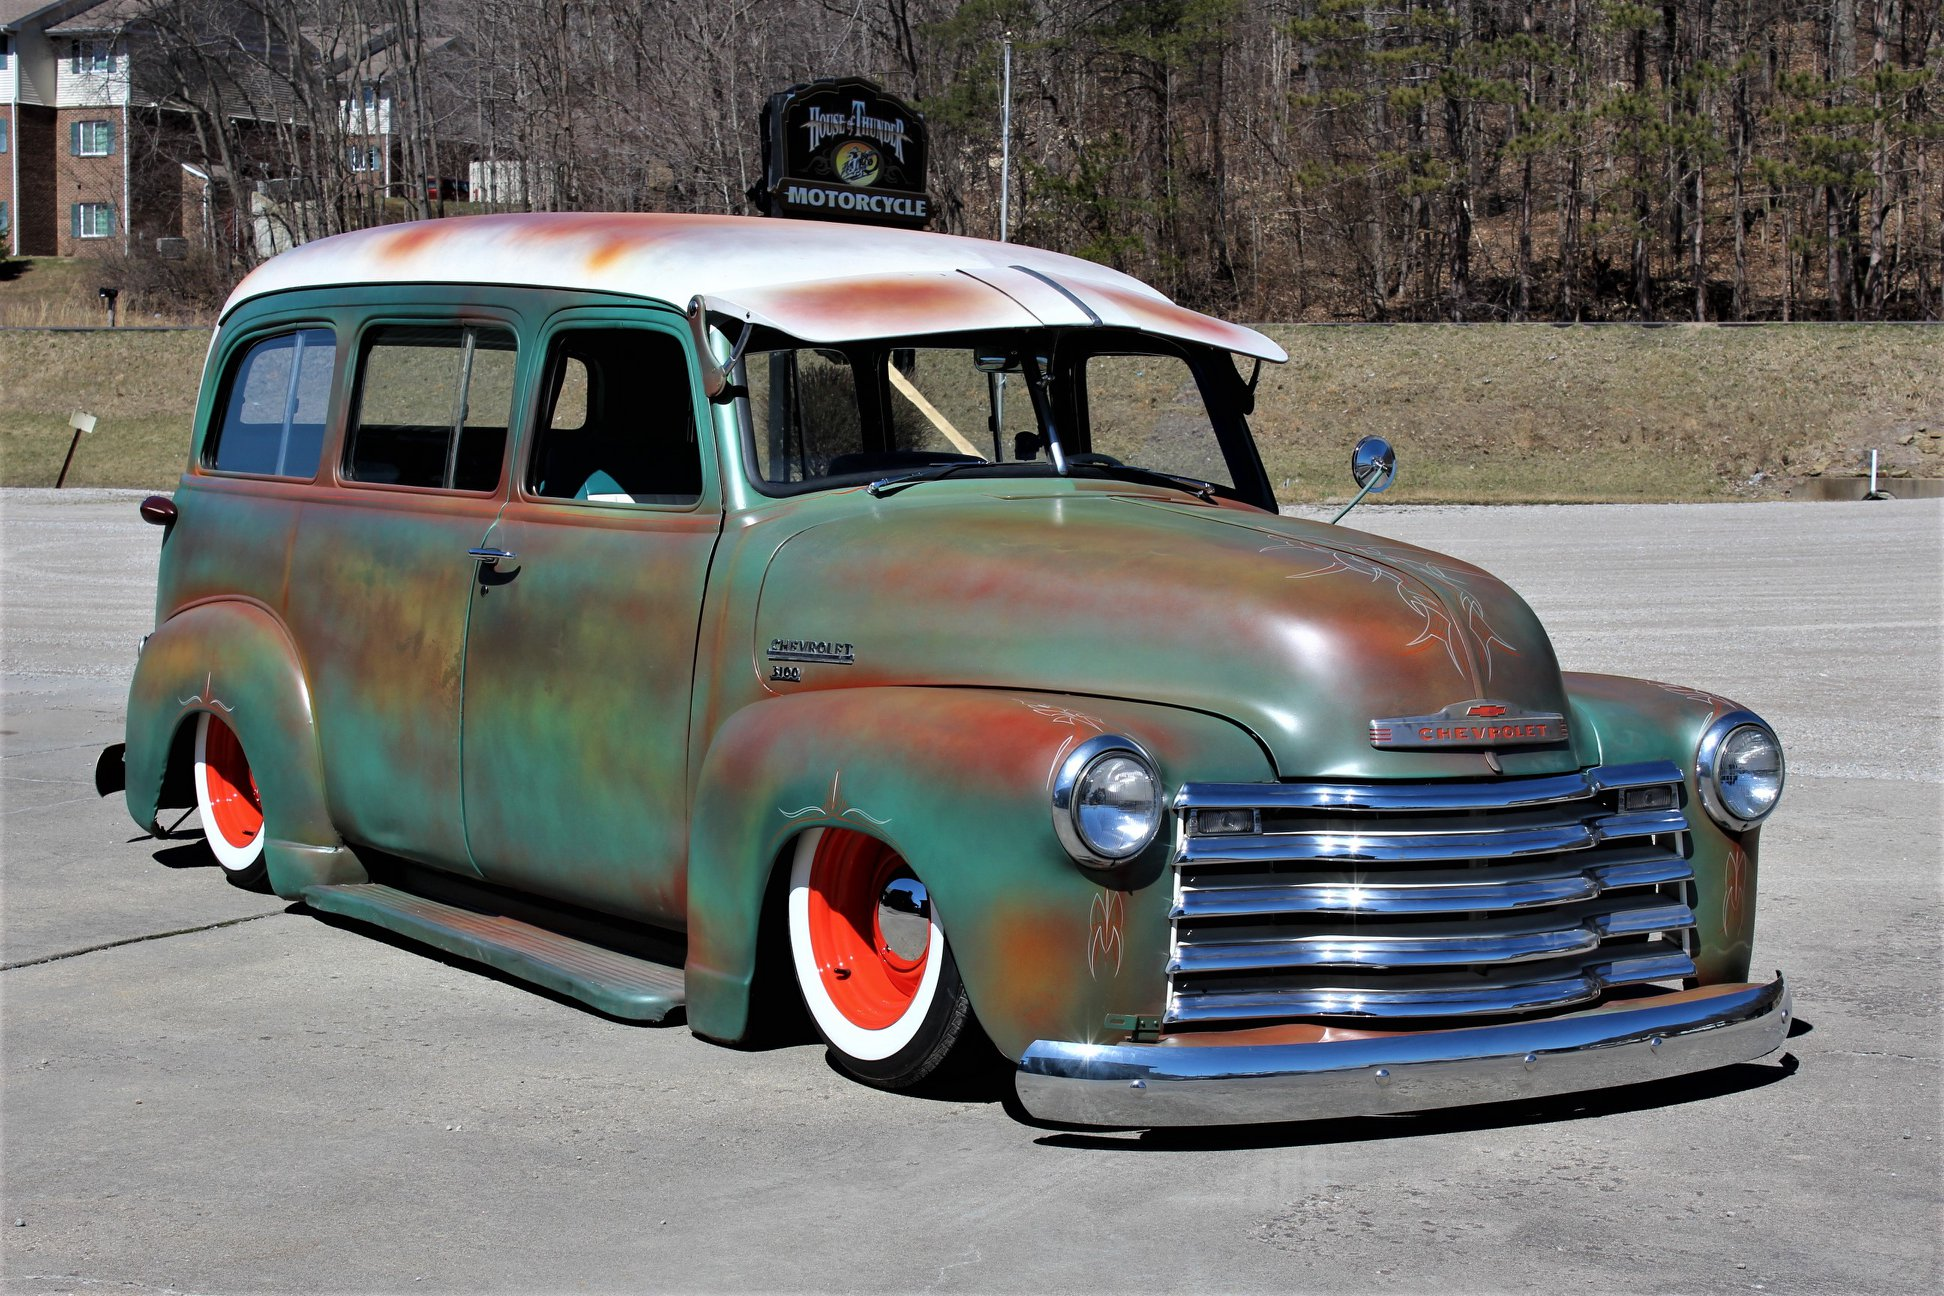 Jim Scaduto - Redwood City, CA - 1950 Chevy Suburban